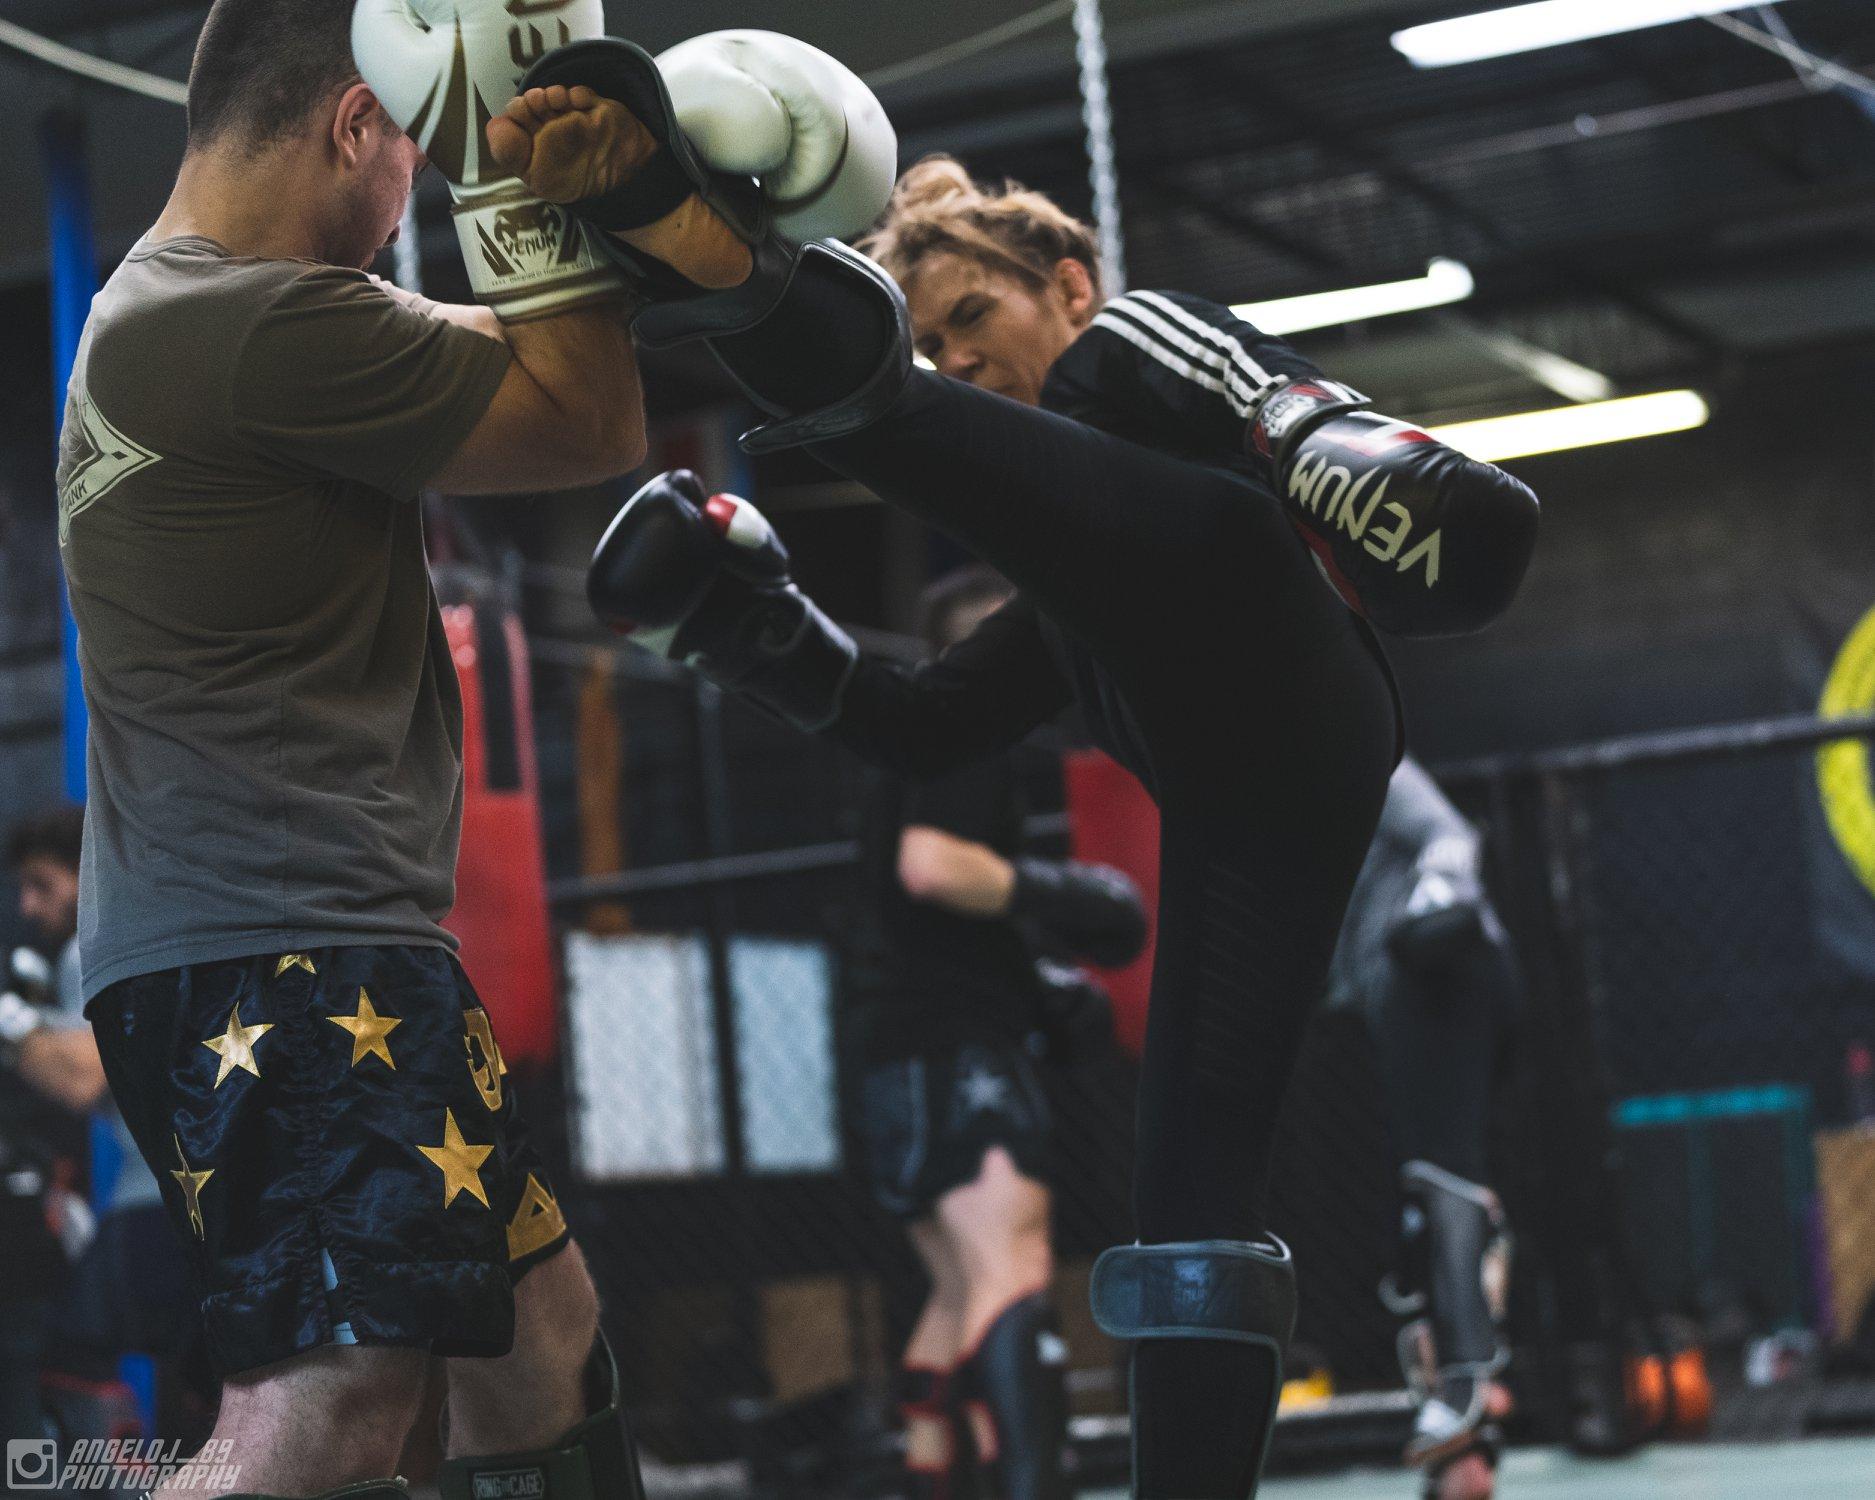 Killer B Kickboxing